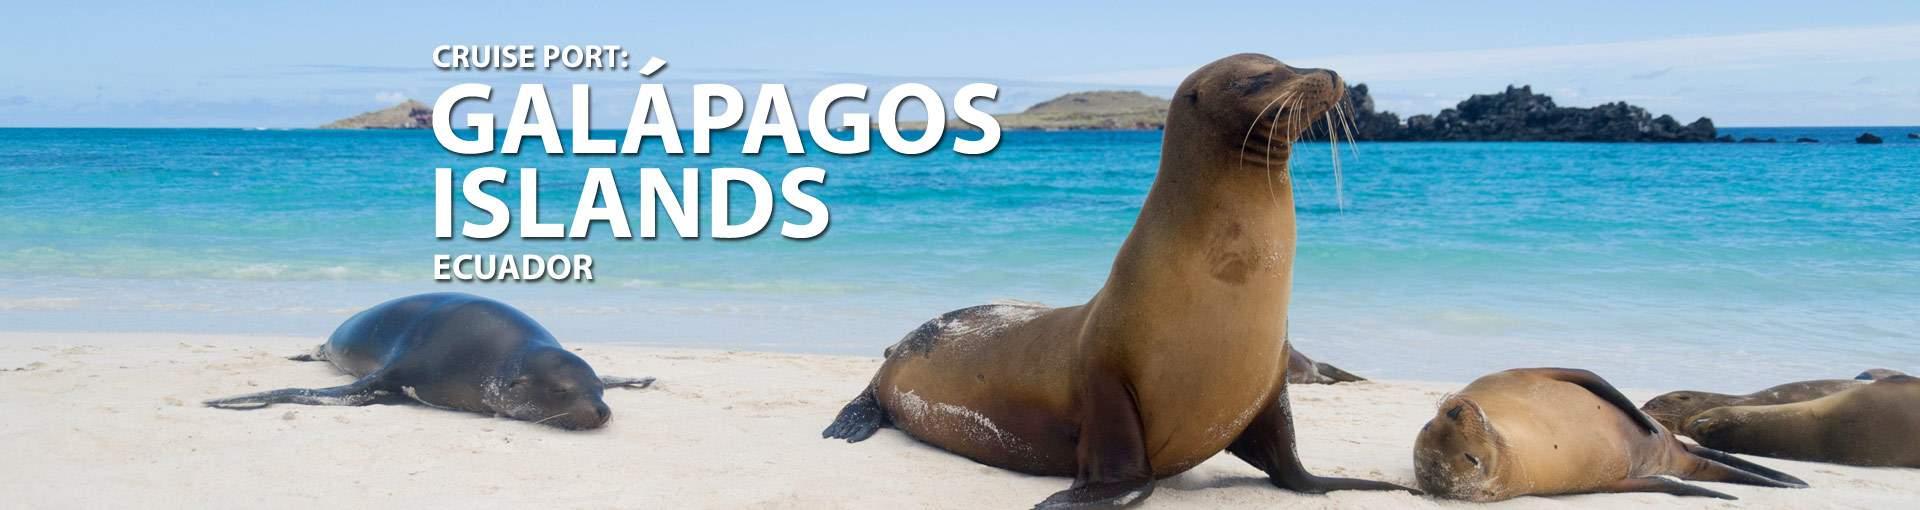 Cruises from the Galapagos Islands, Ecuador